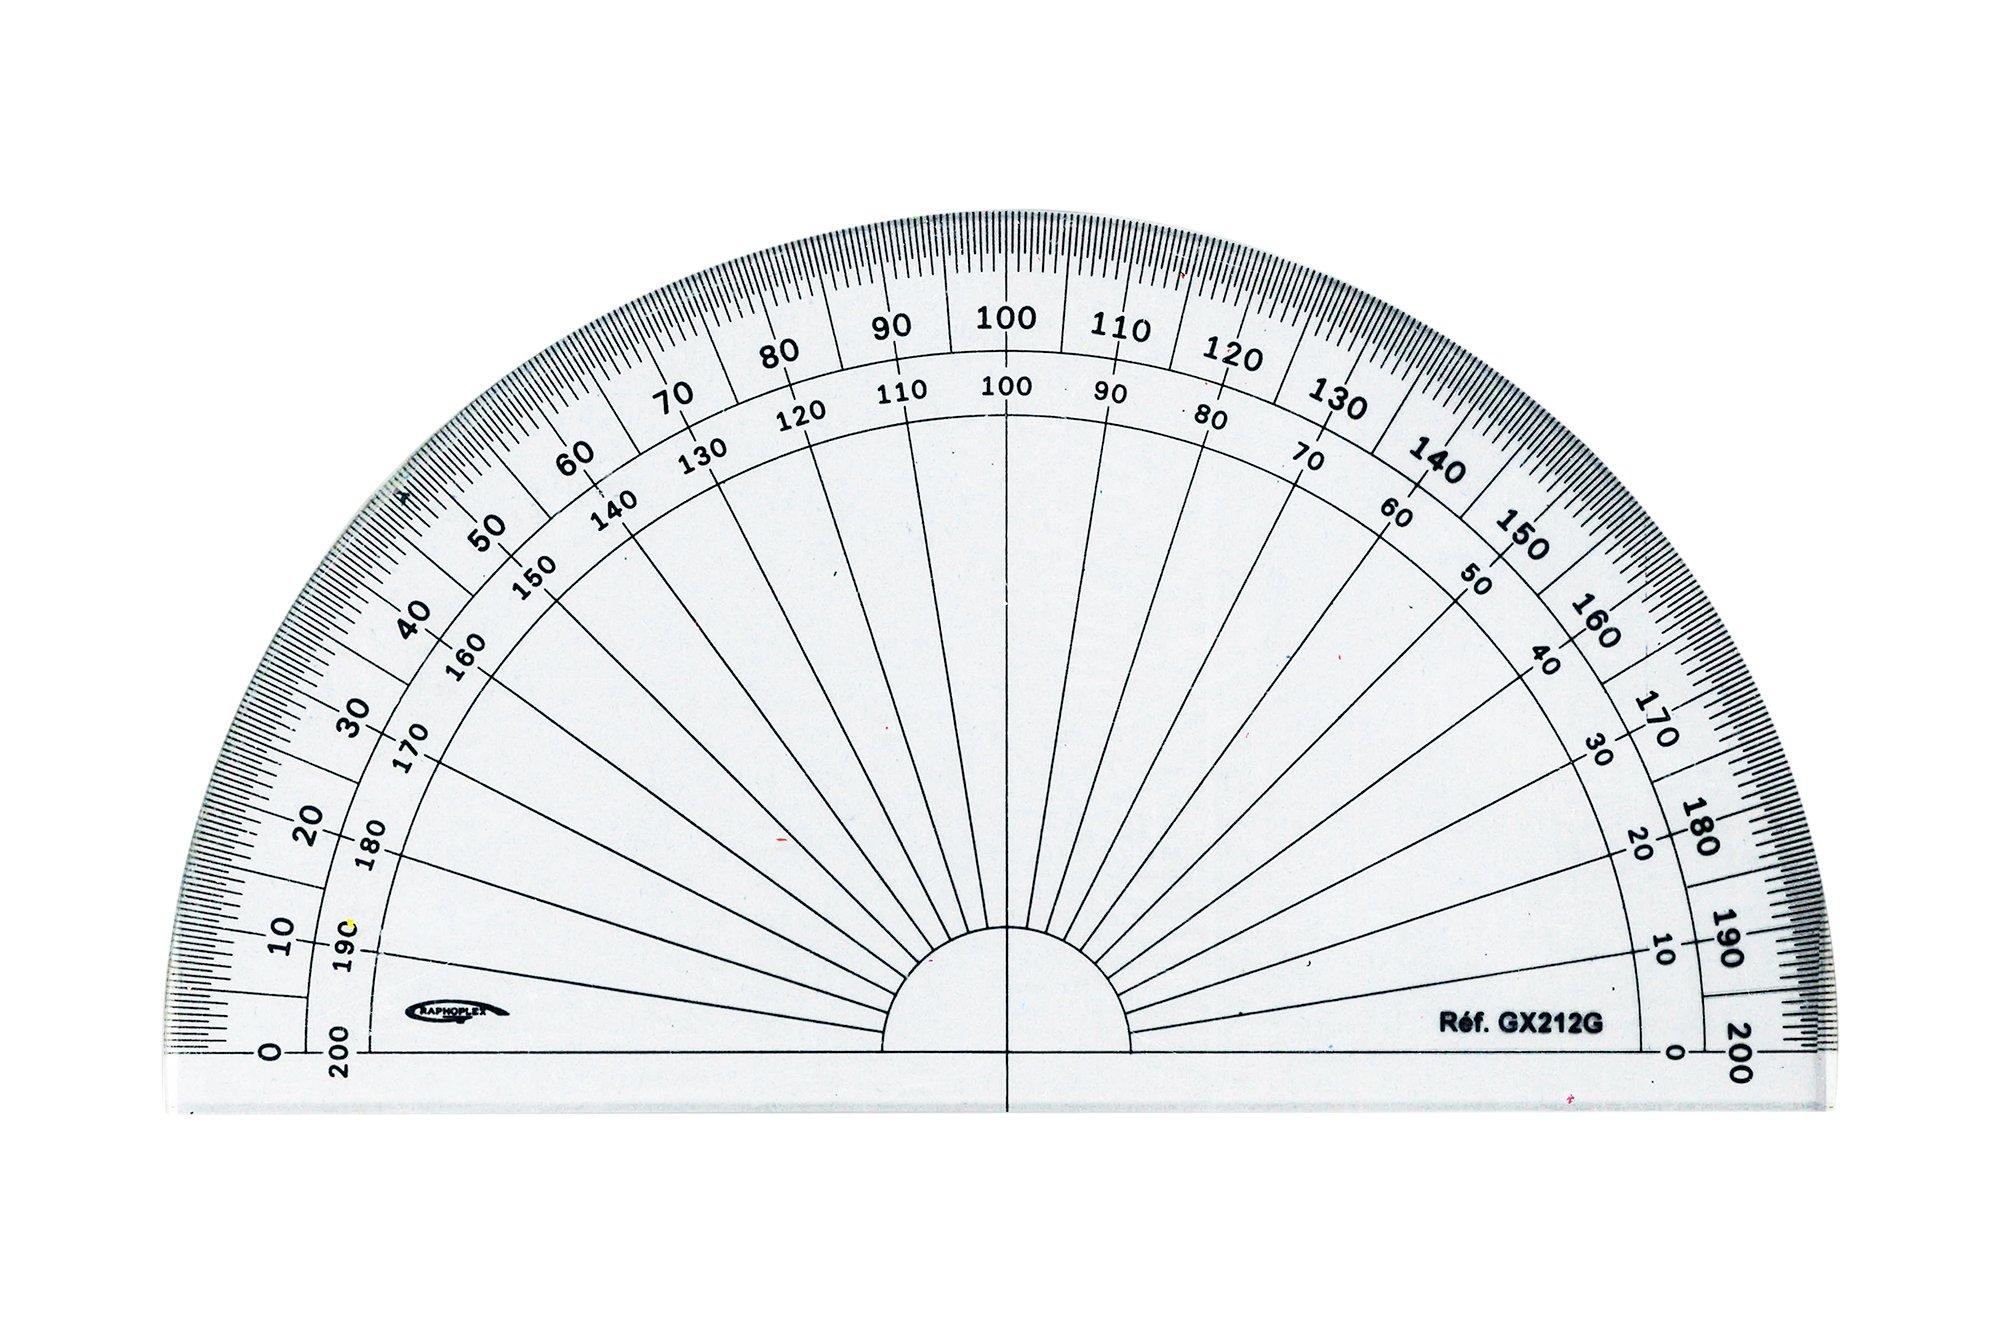 GX212G Grapholex-Protractor-Semi-Circle-Clear